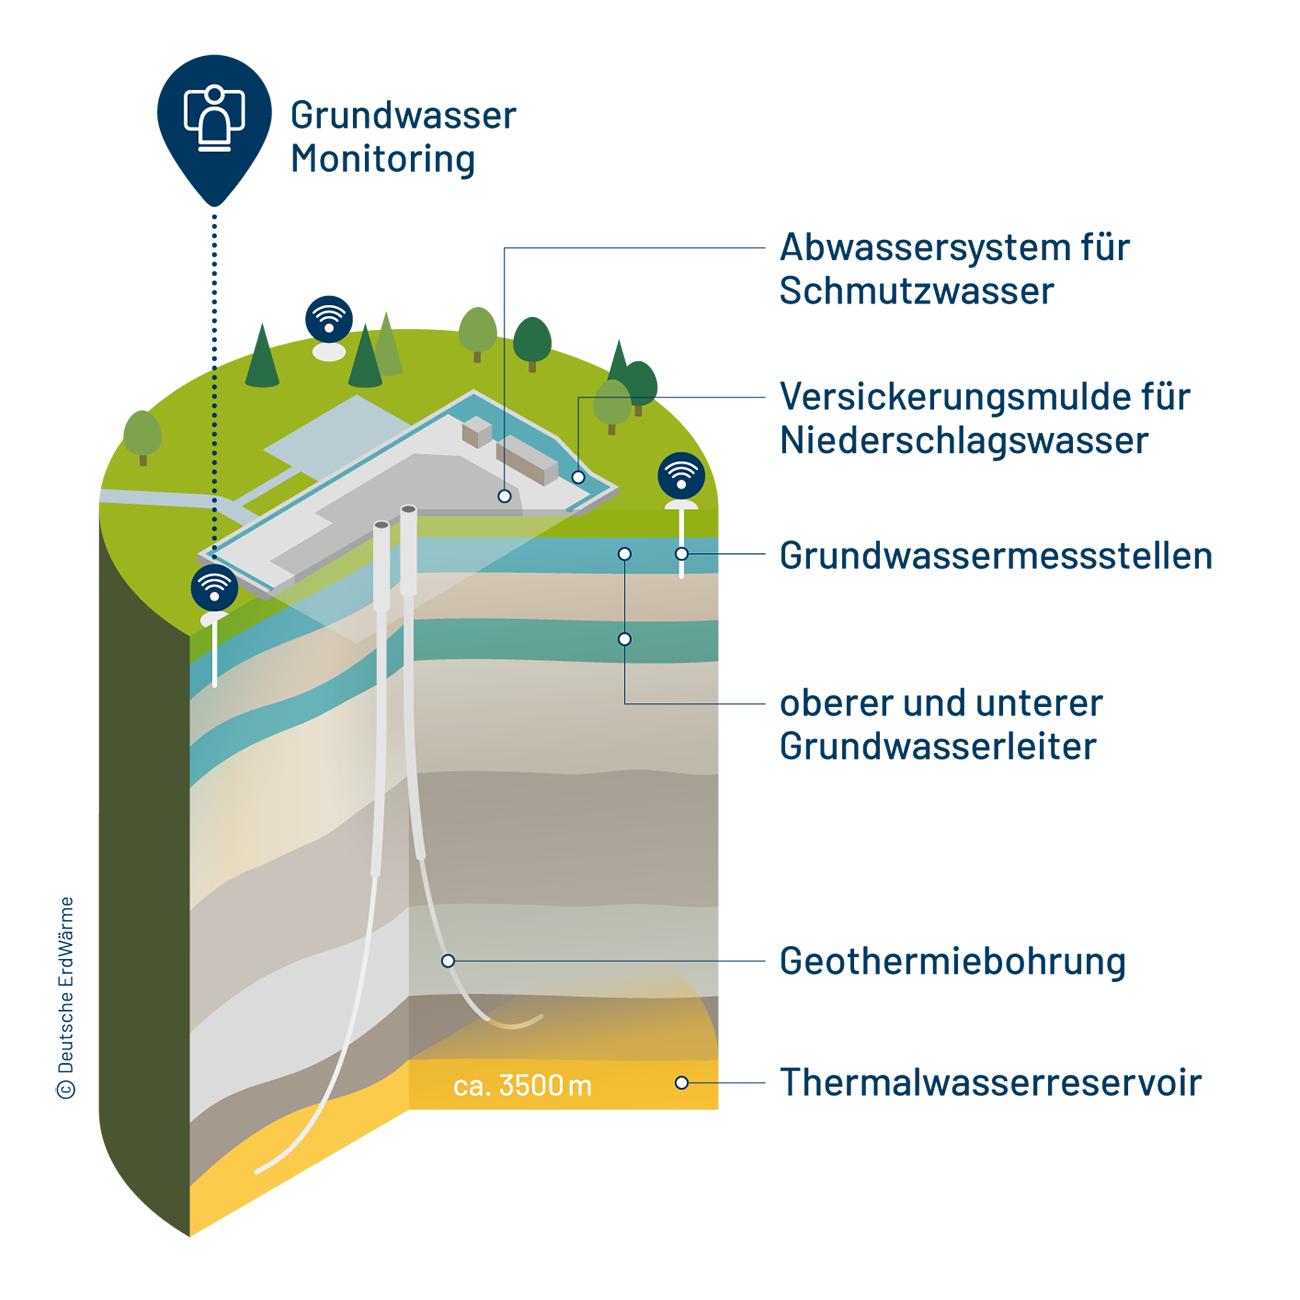 Illustration - Grundwasser-Monitoring